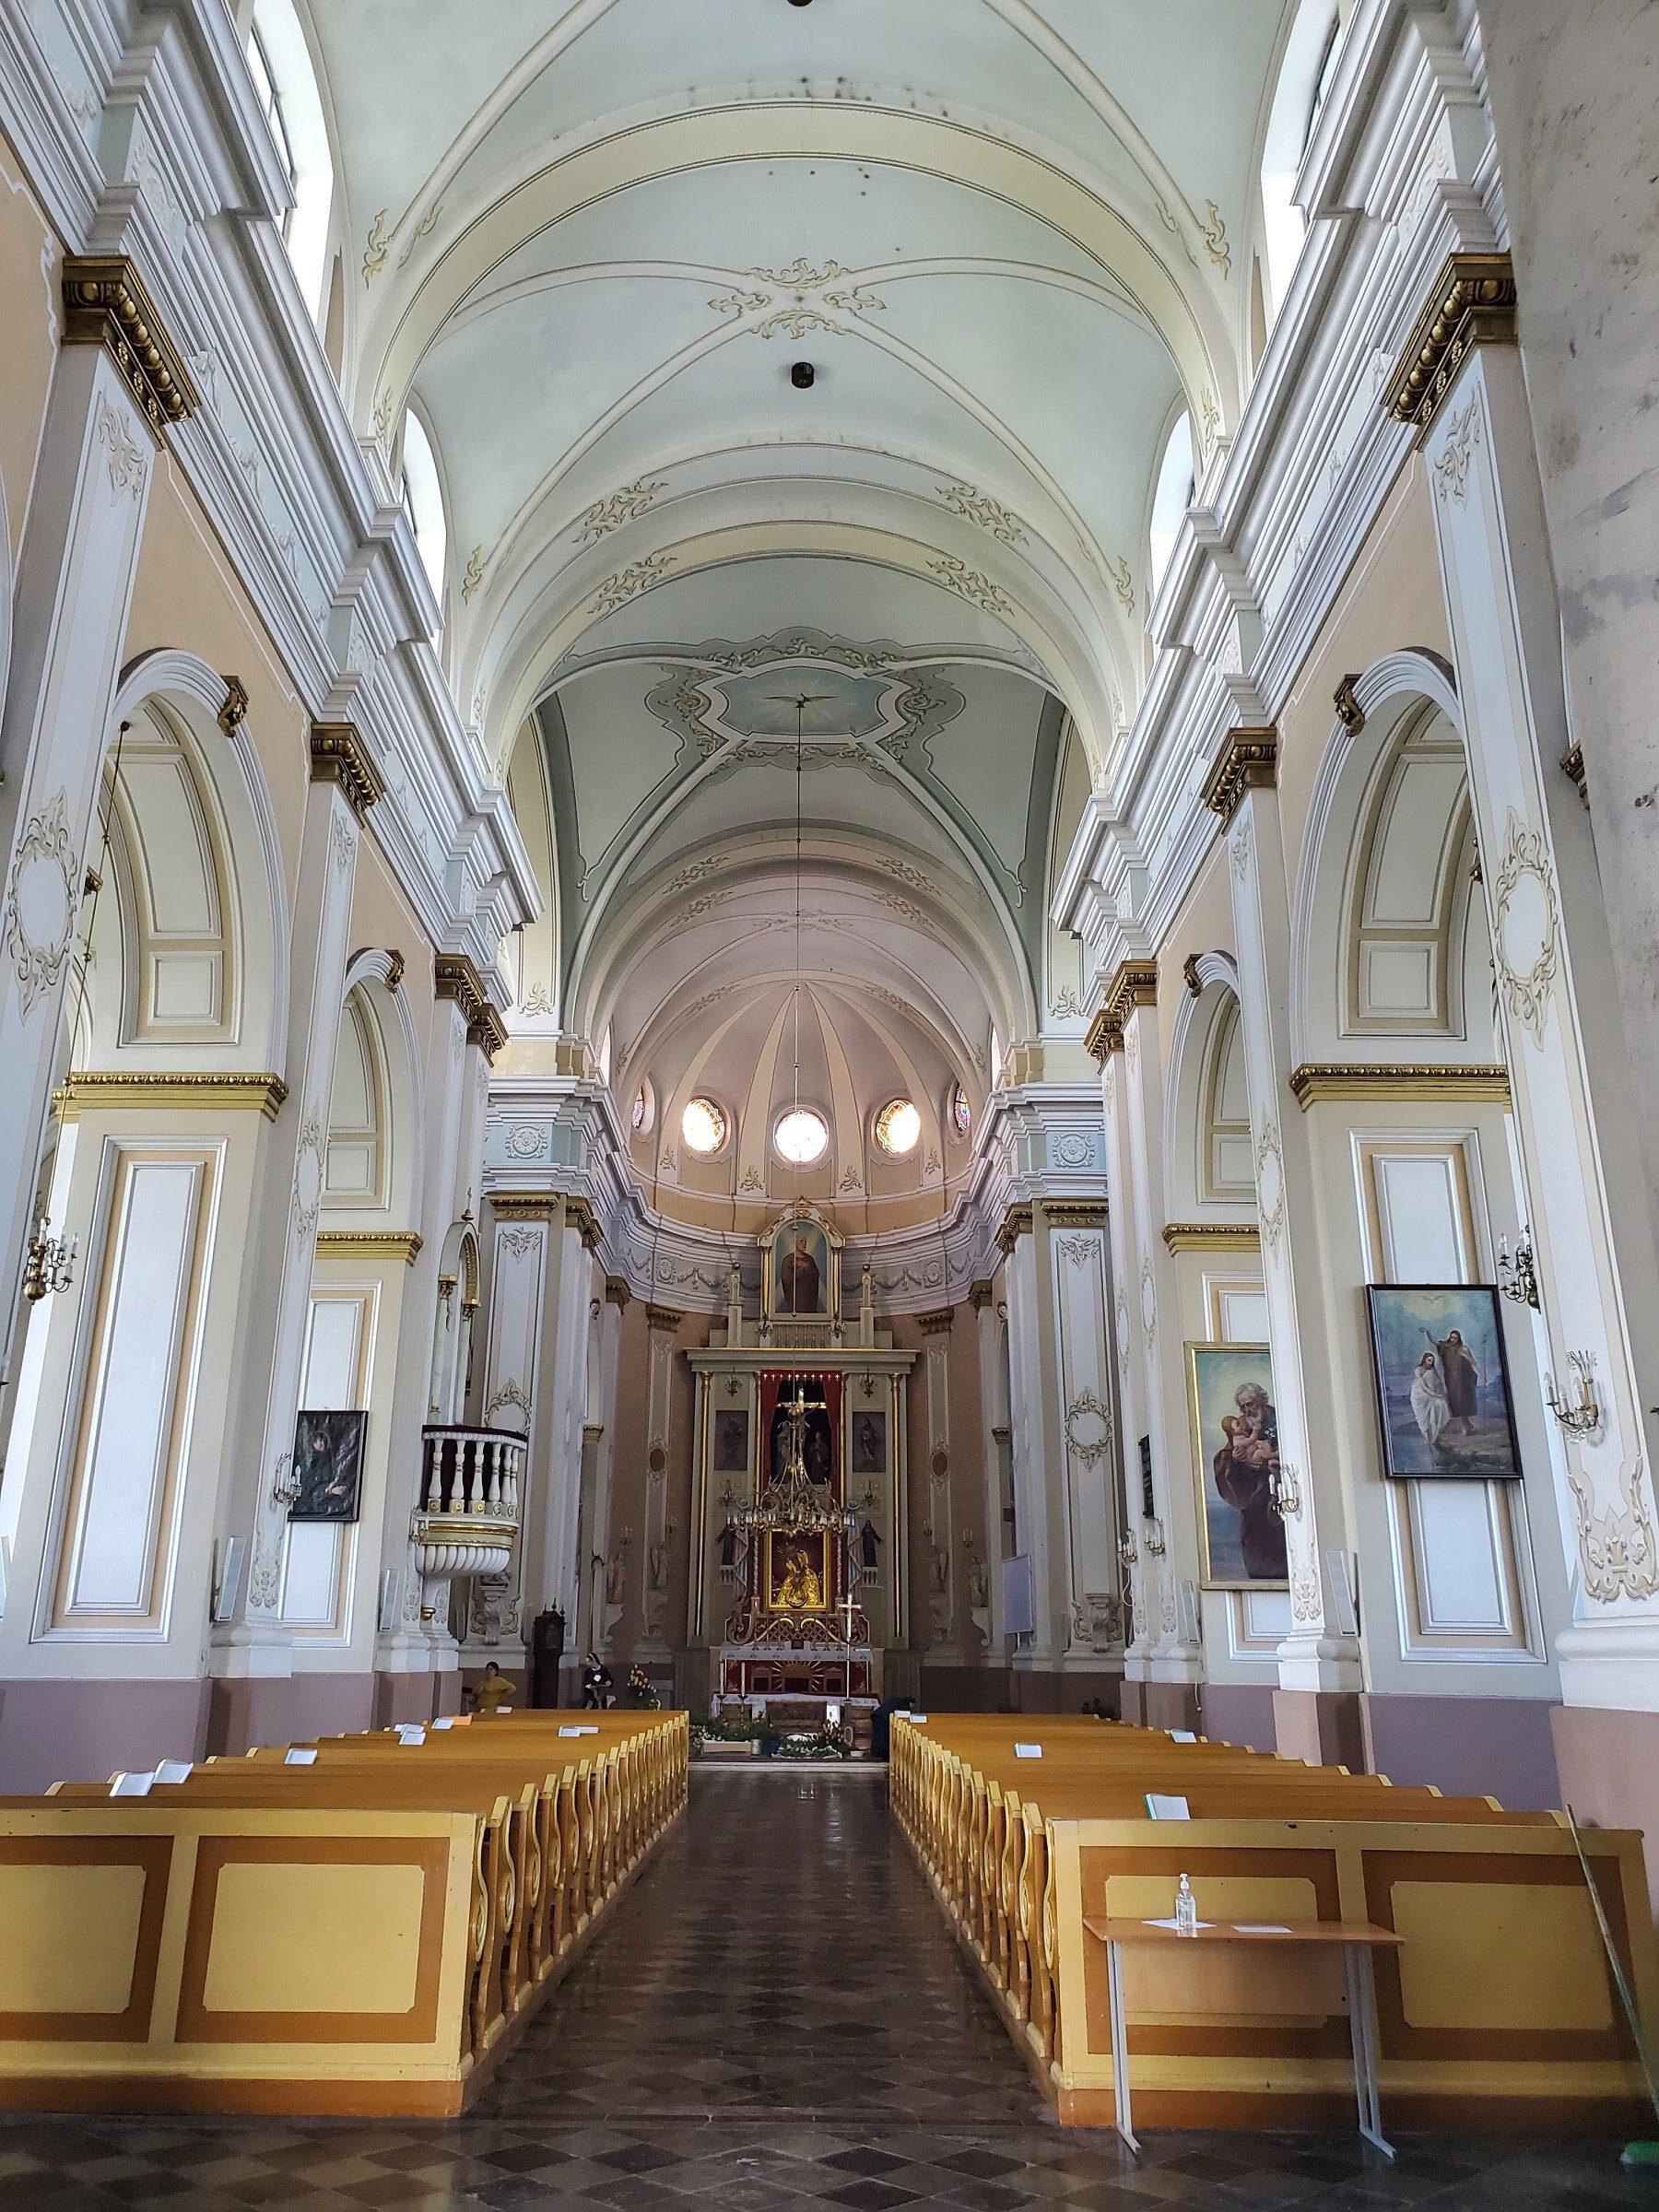 20200606 111017 rotated e1605867704676 - Костел Святого Андрея Баболи в Лынтупах